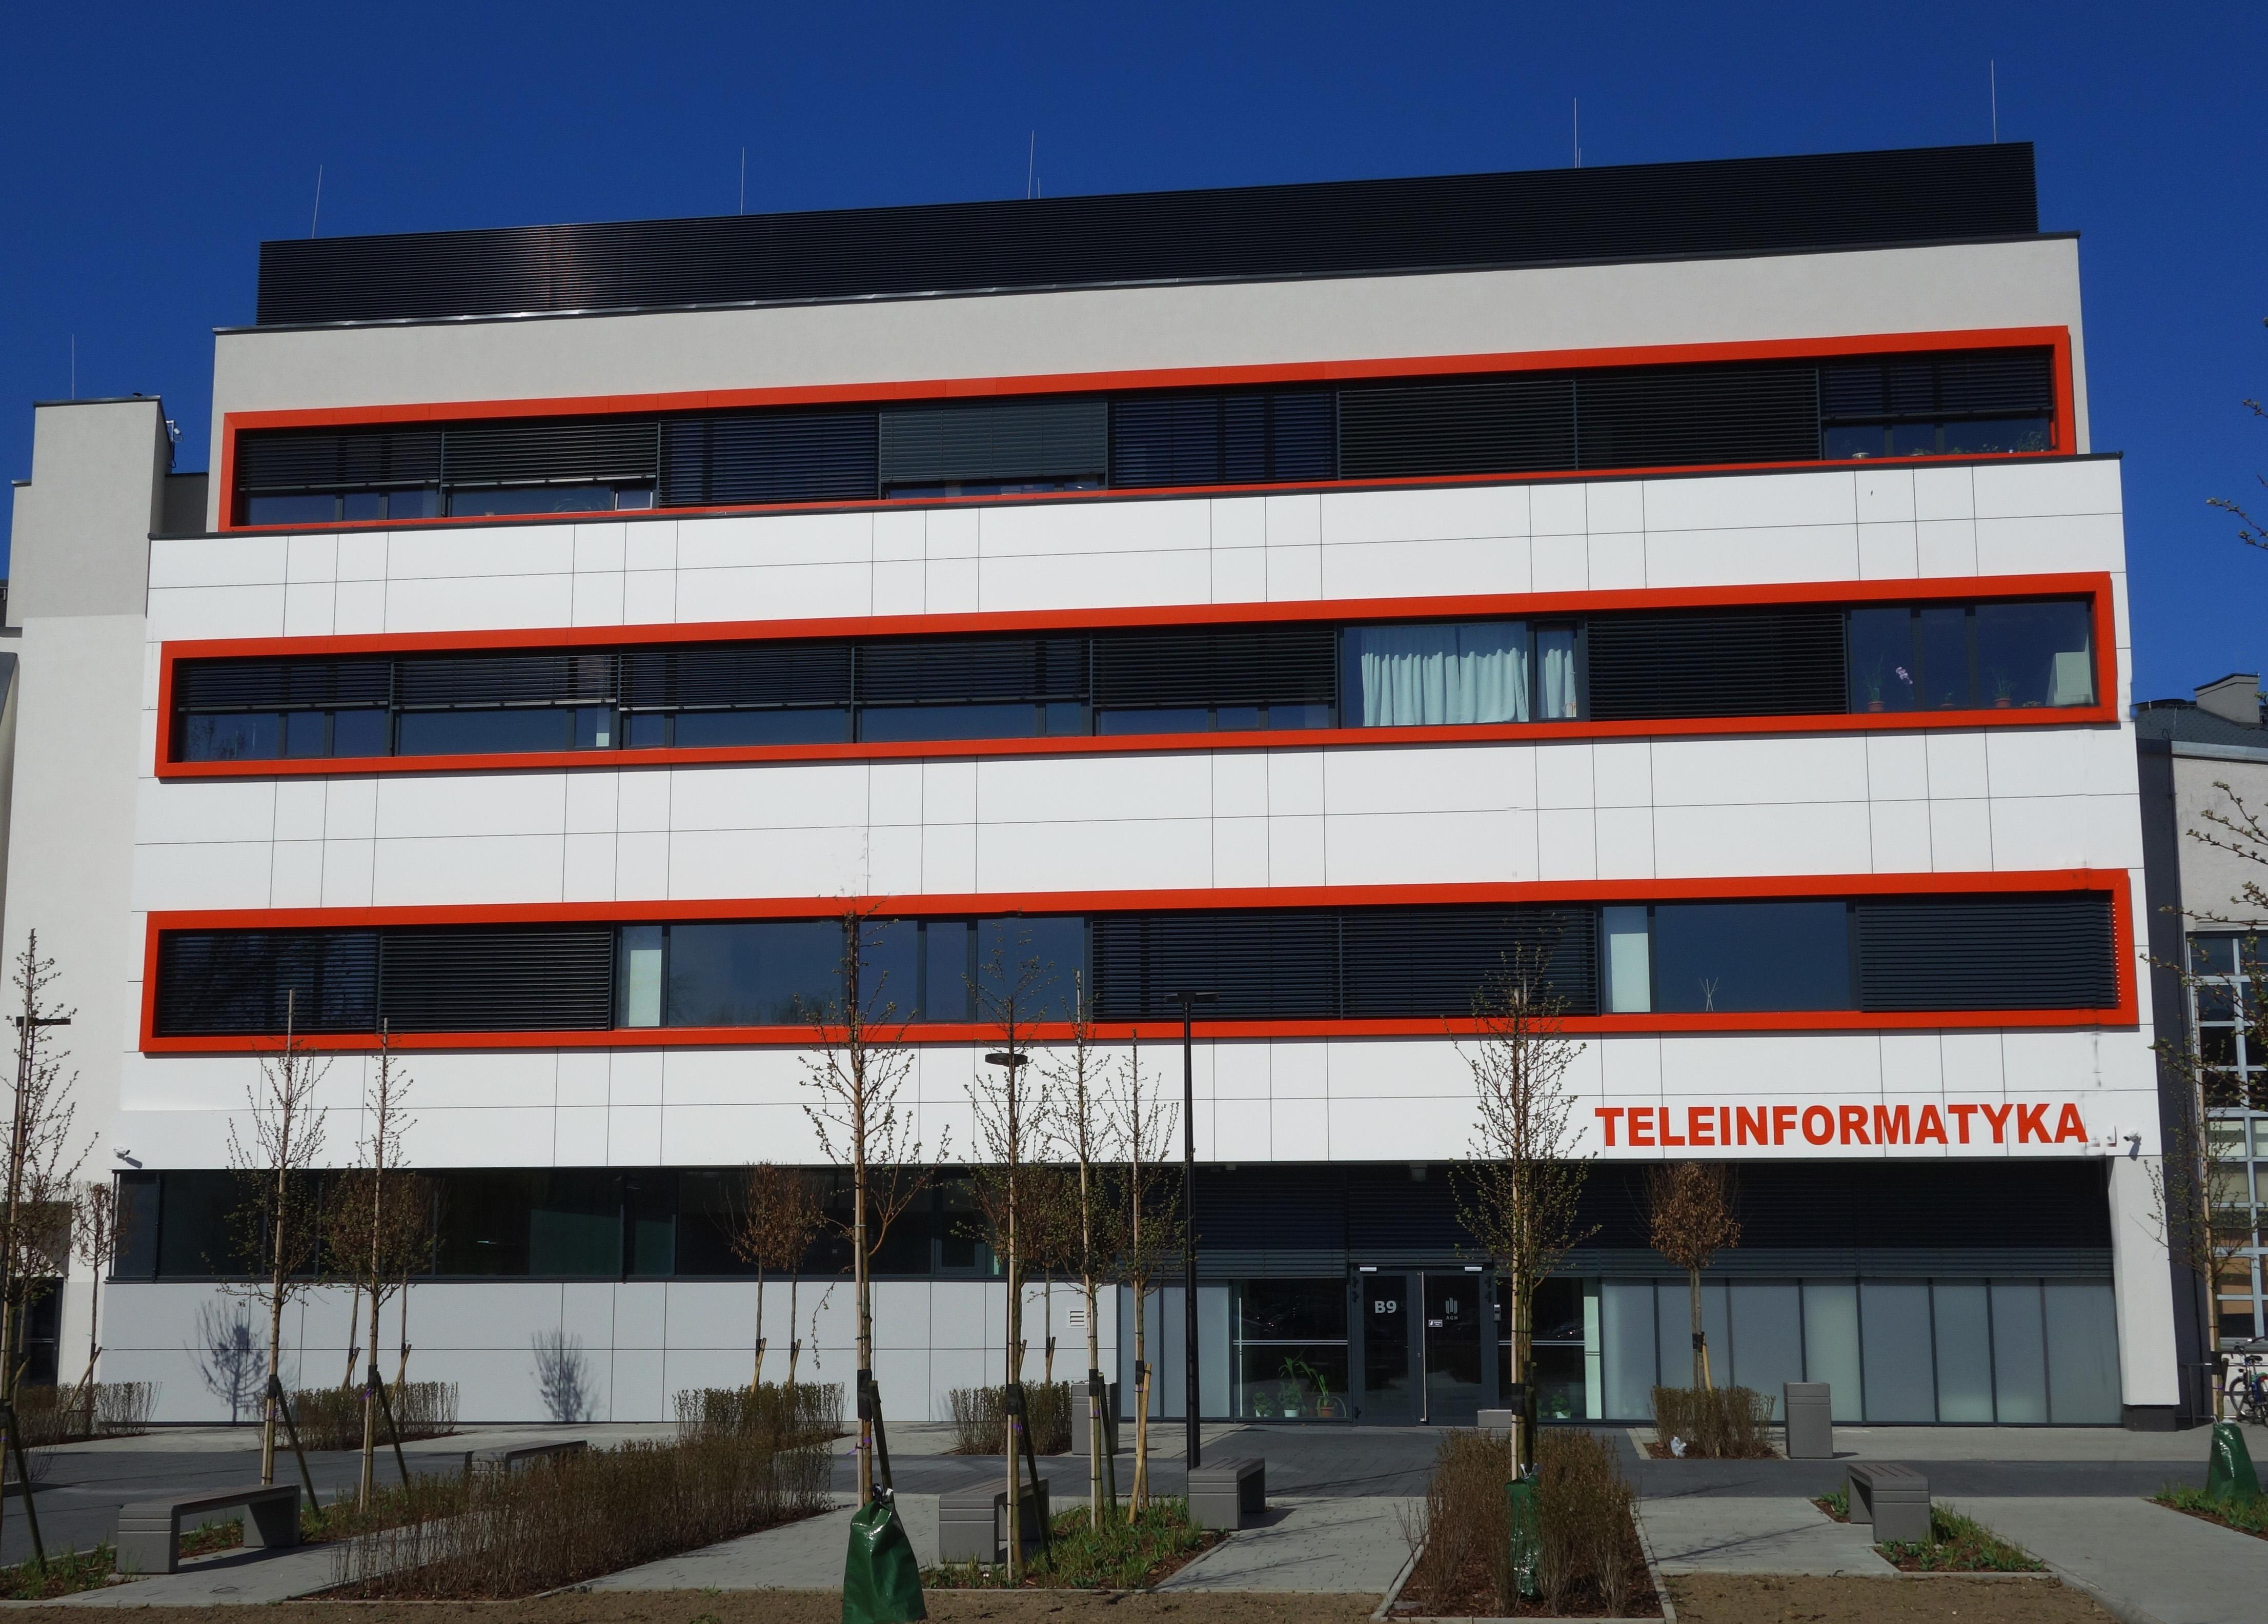 Budynek Katedry Telekomunikacji AGH